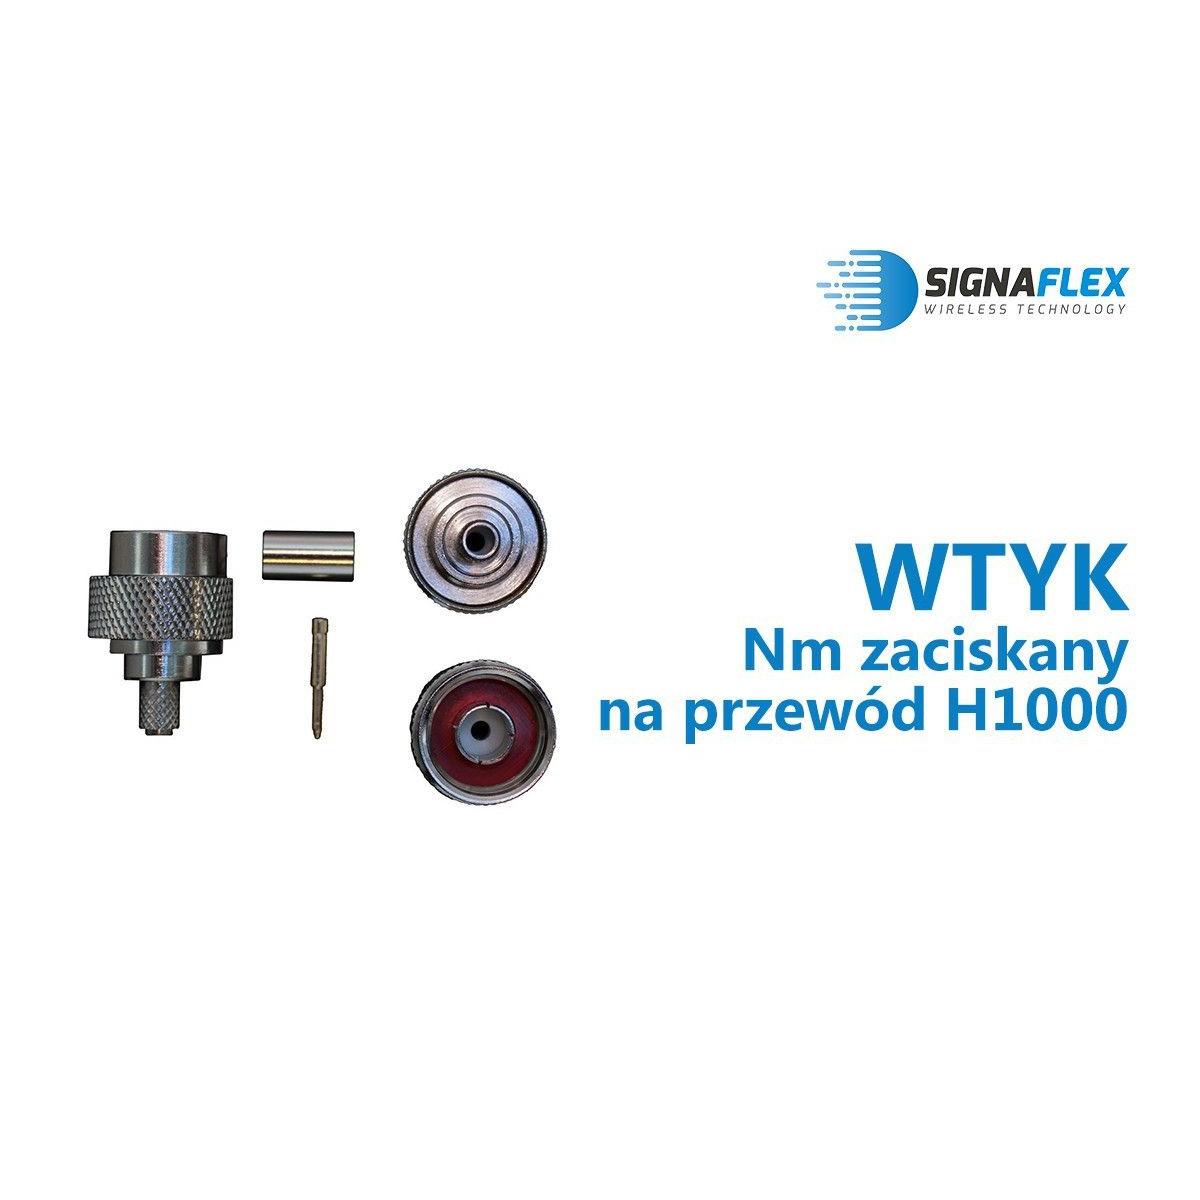 Wtyk Nm na przewód H1000/SRF400